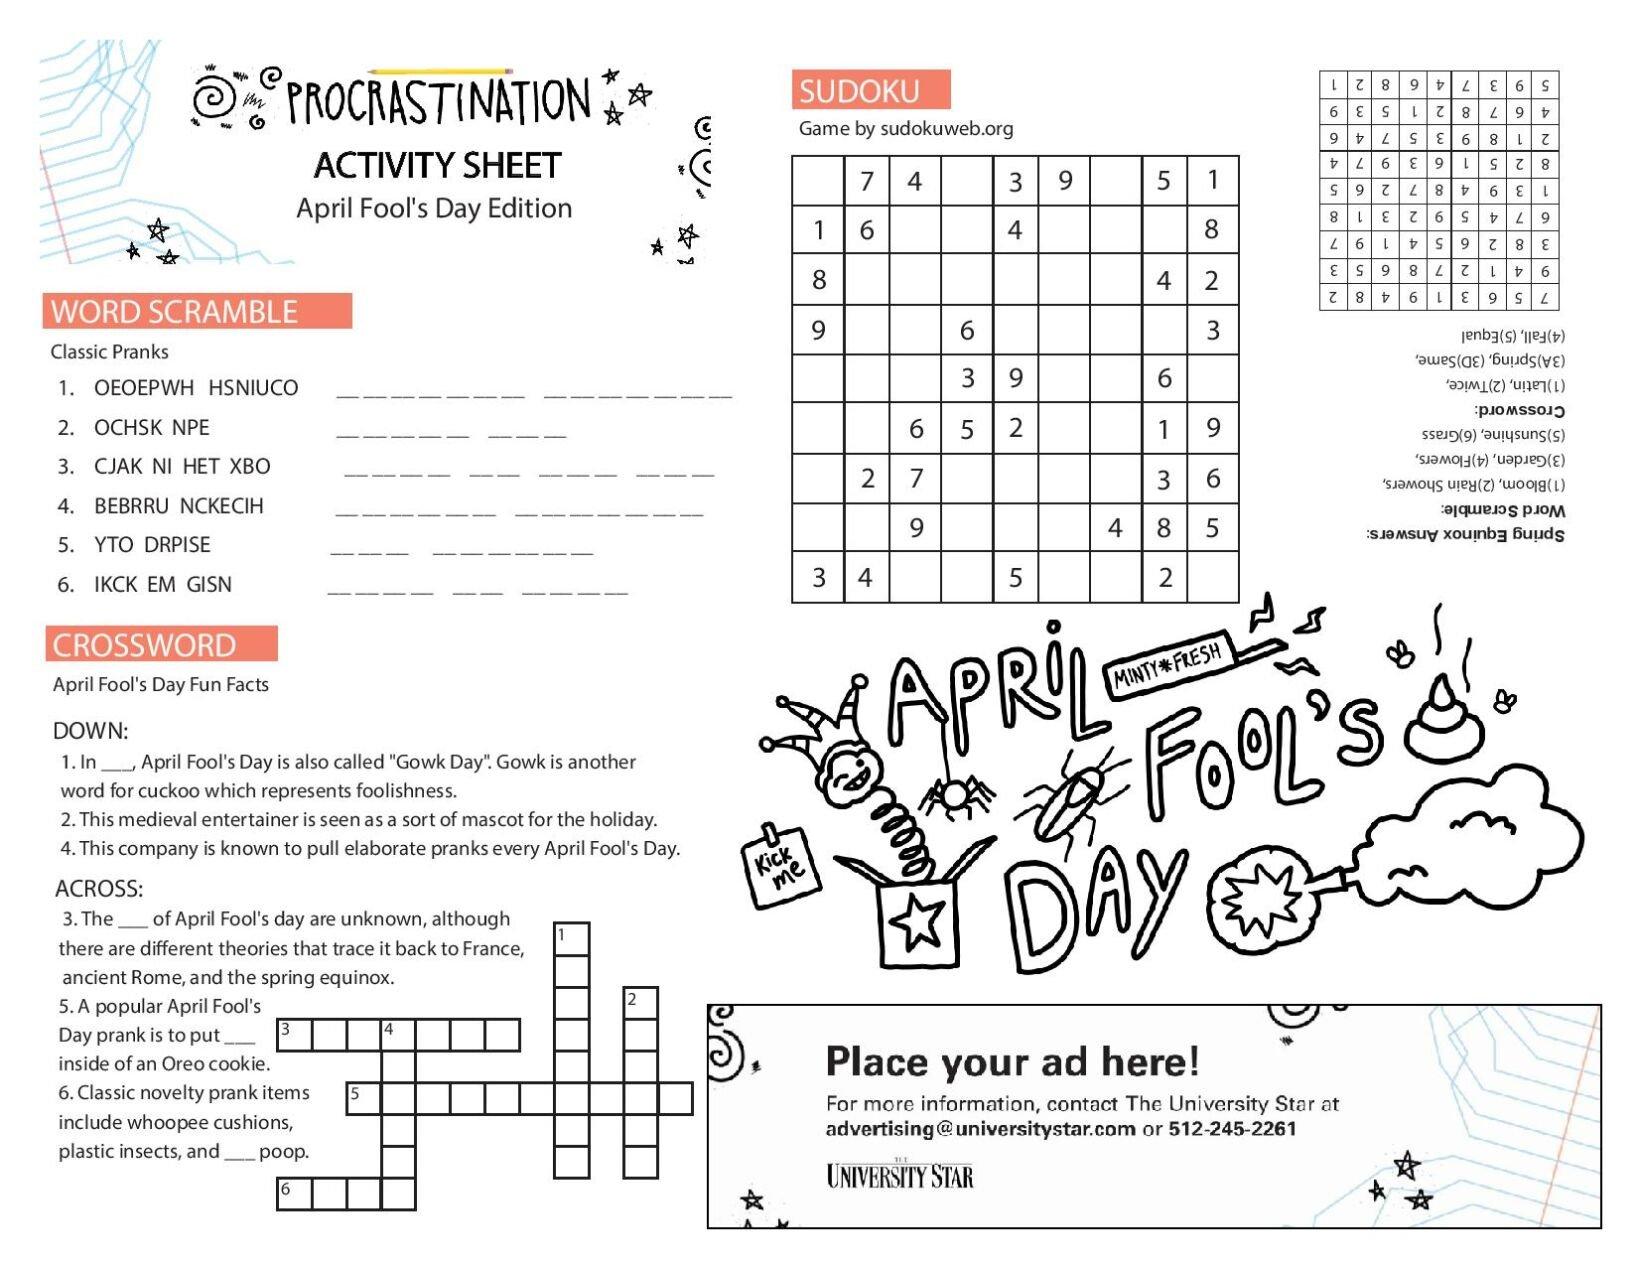 03/30 printable activity sheet.